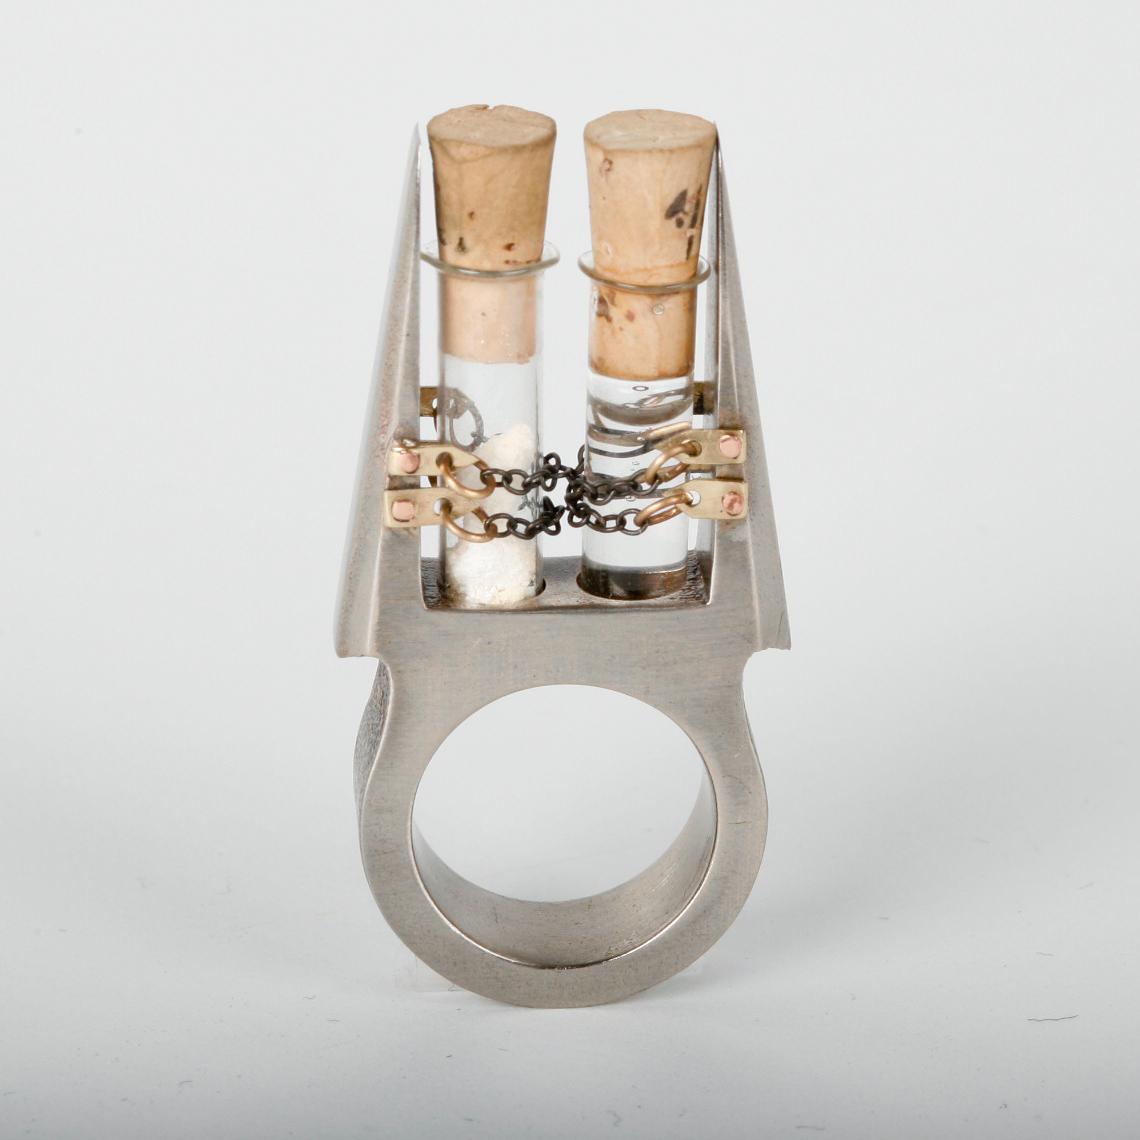 Vial Ring